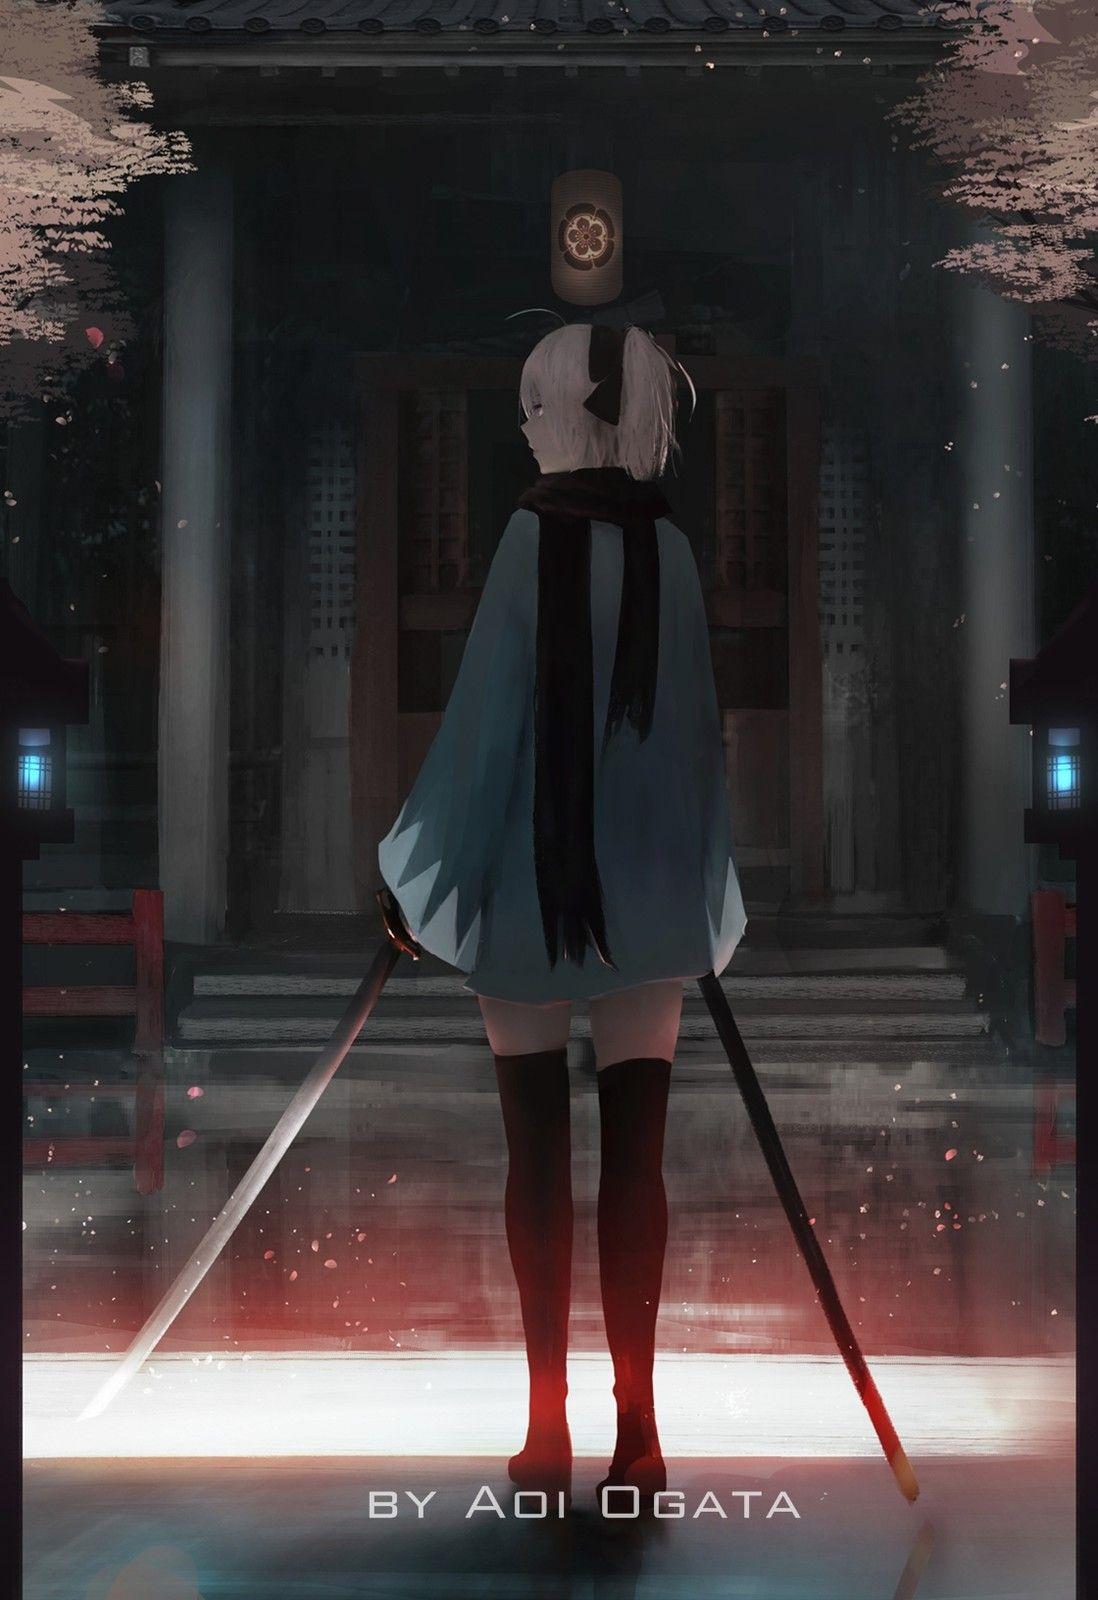 Okita Souji, Aoi Ogata